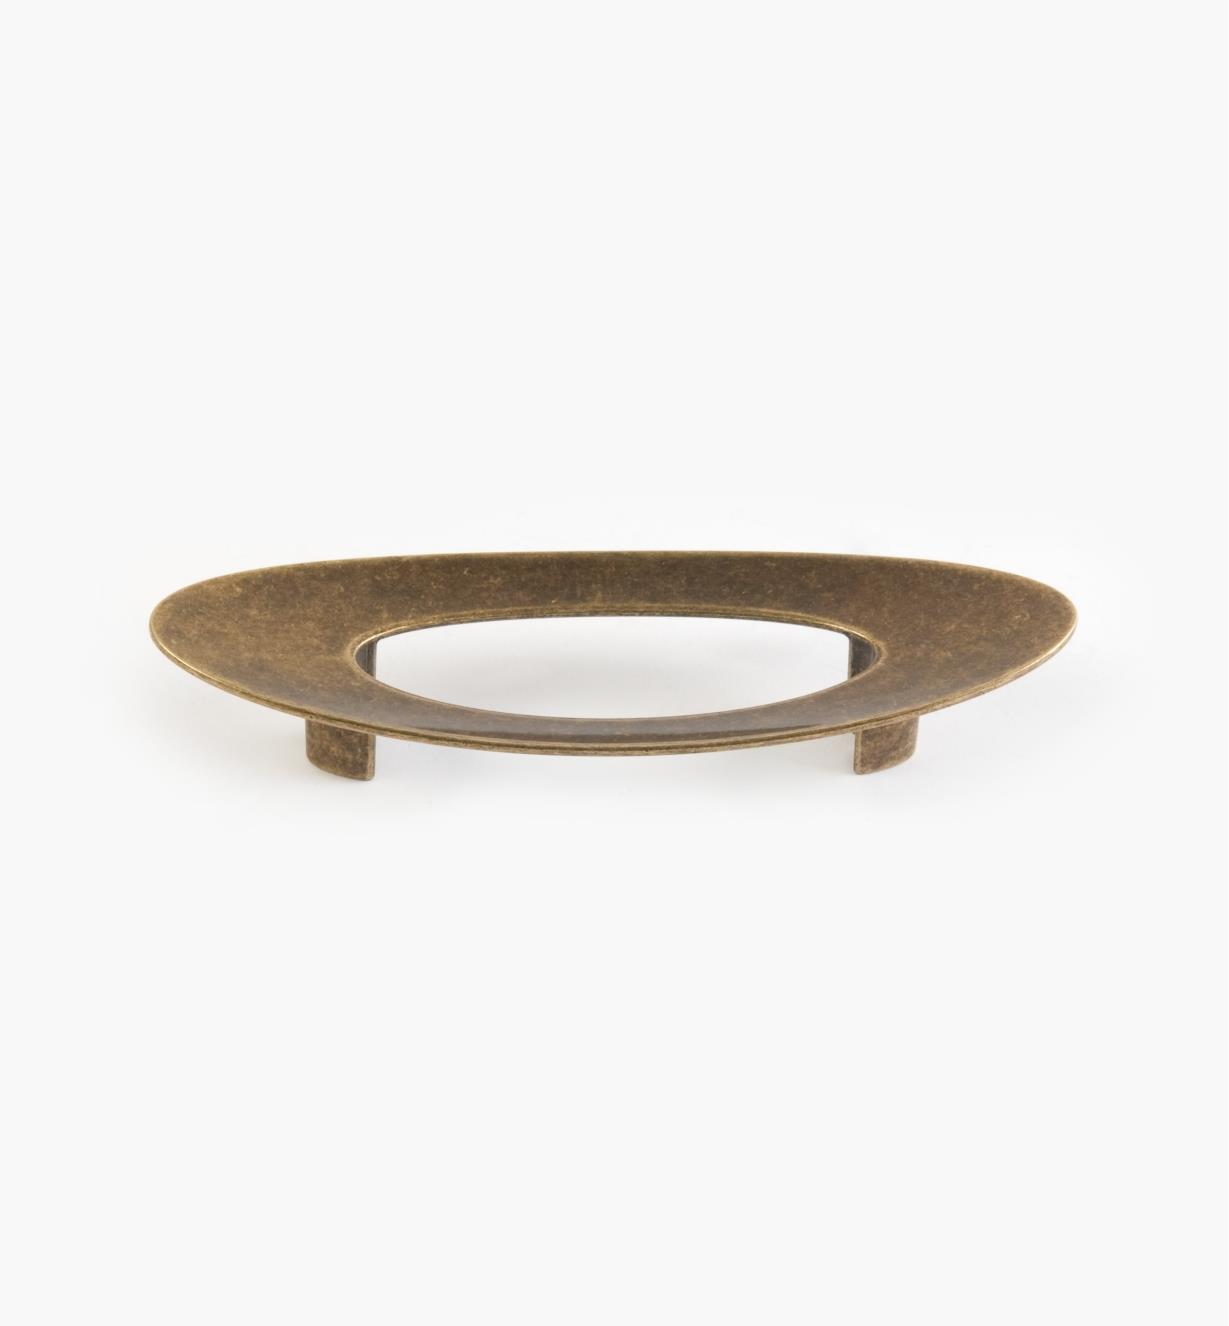 01G1654 - 96mm x 30mm Antique Brass Oval Ventana Pull